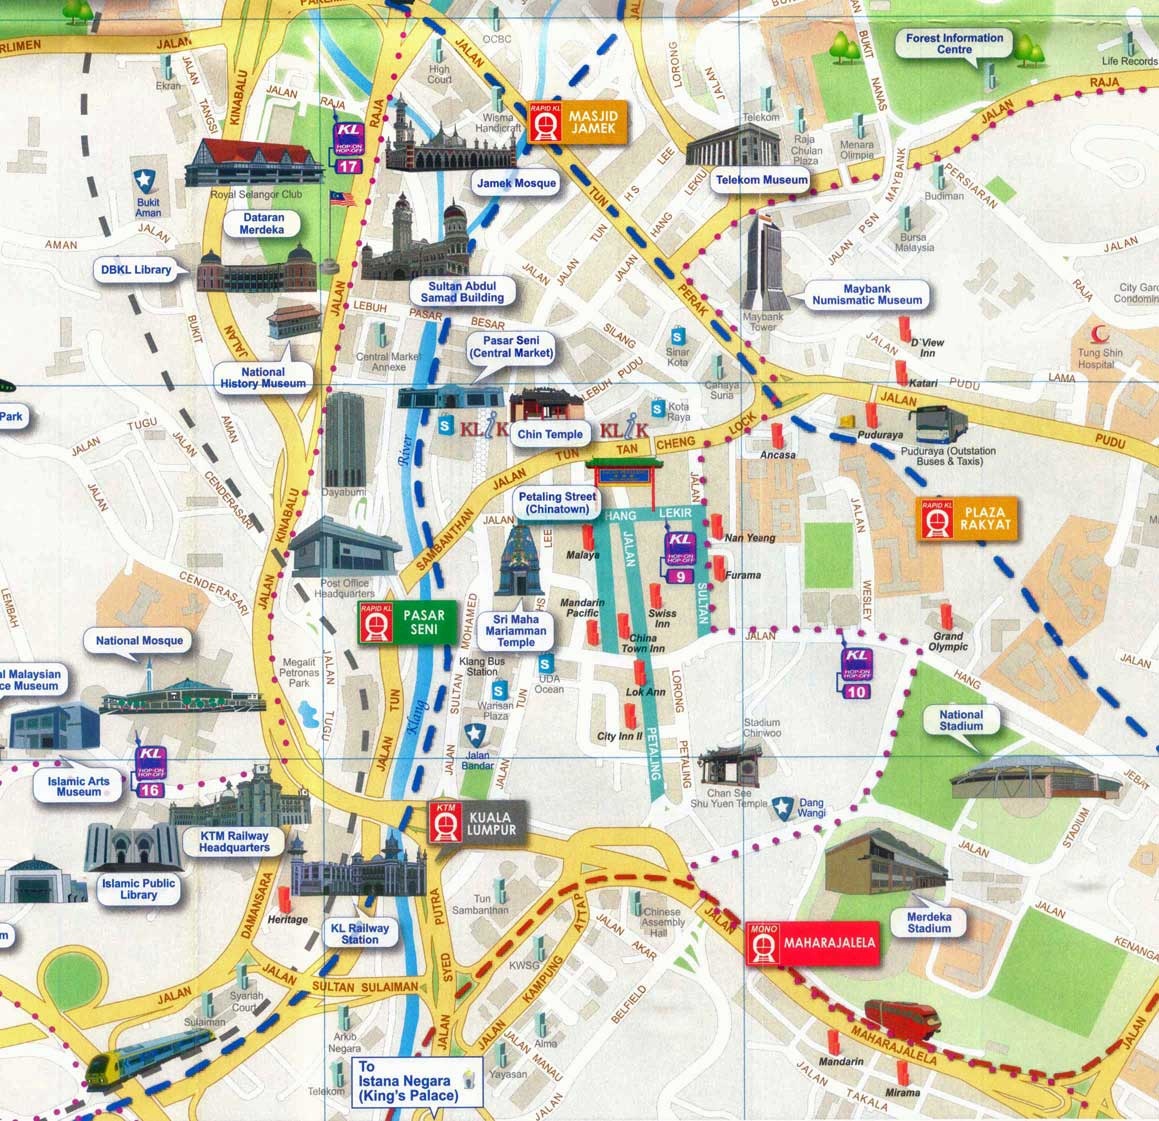 Malaysia: Map Of Kuala Lumpur, Malaysia